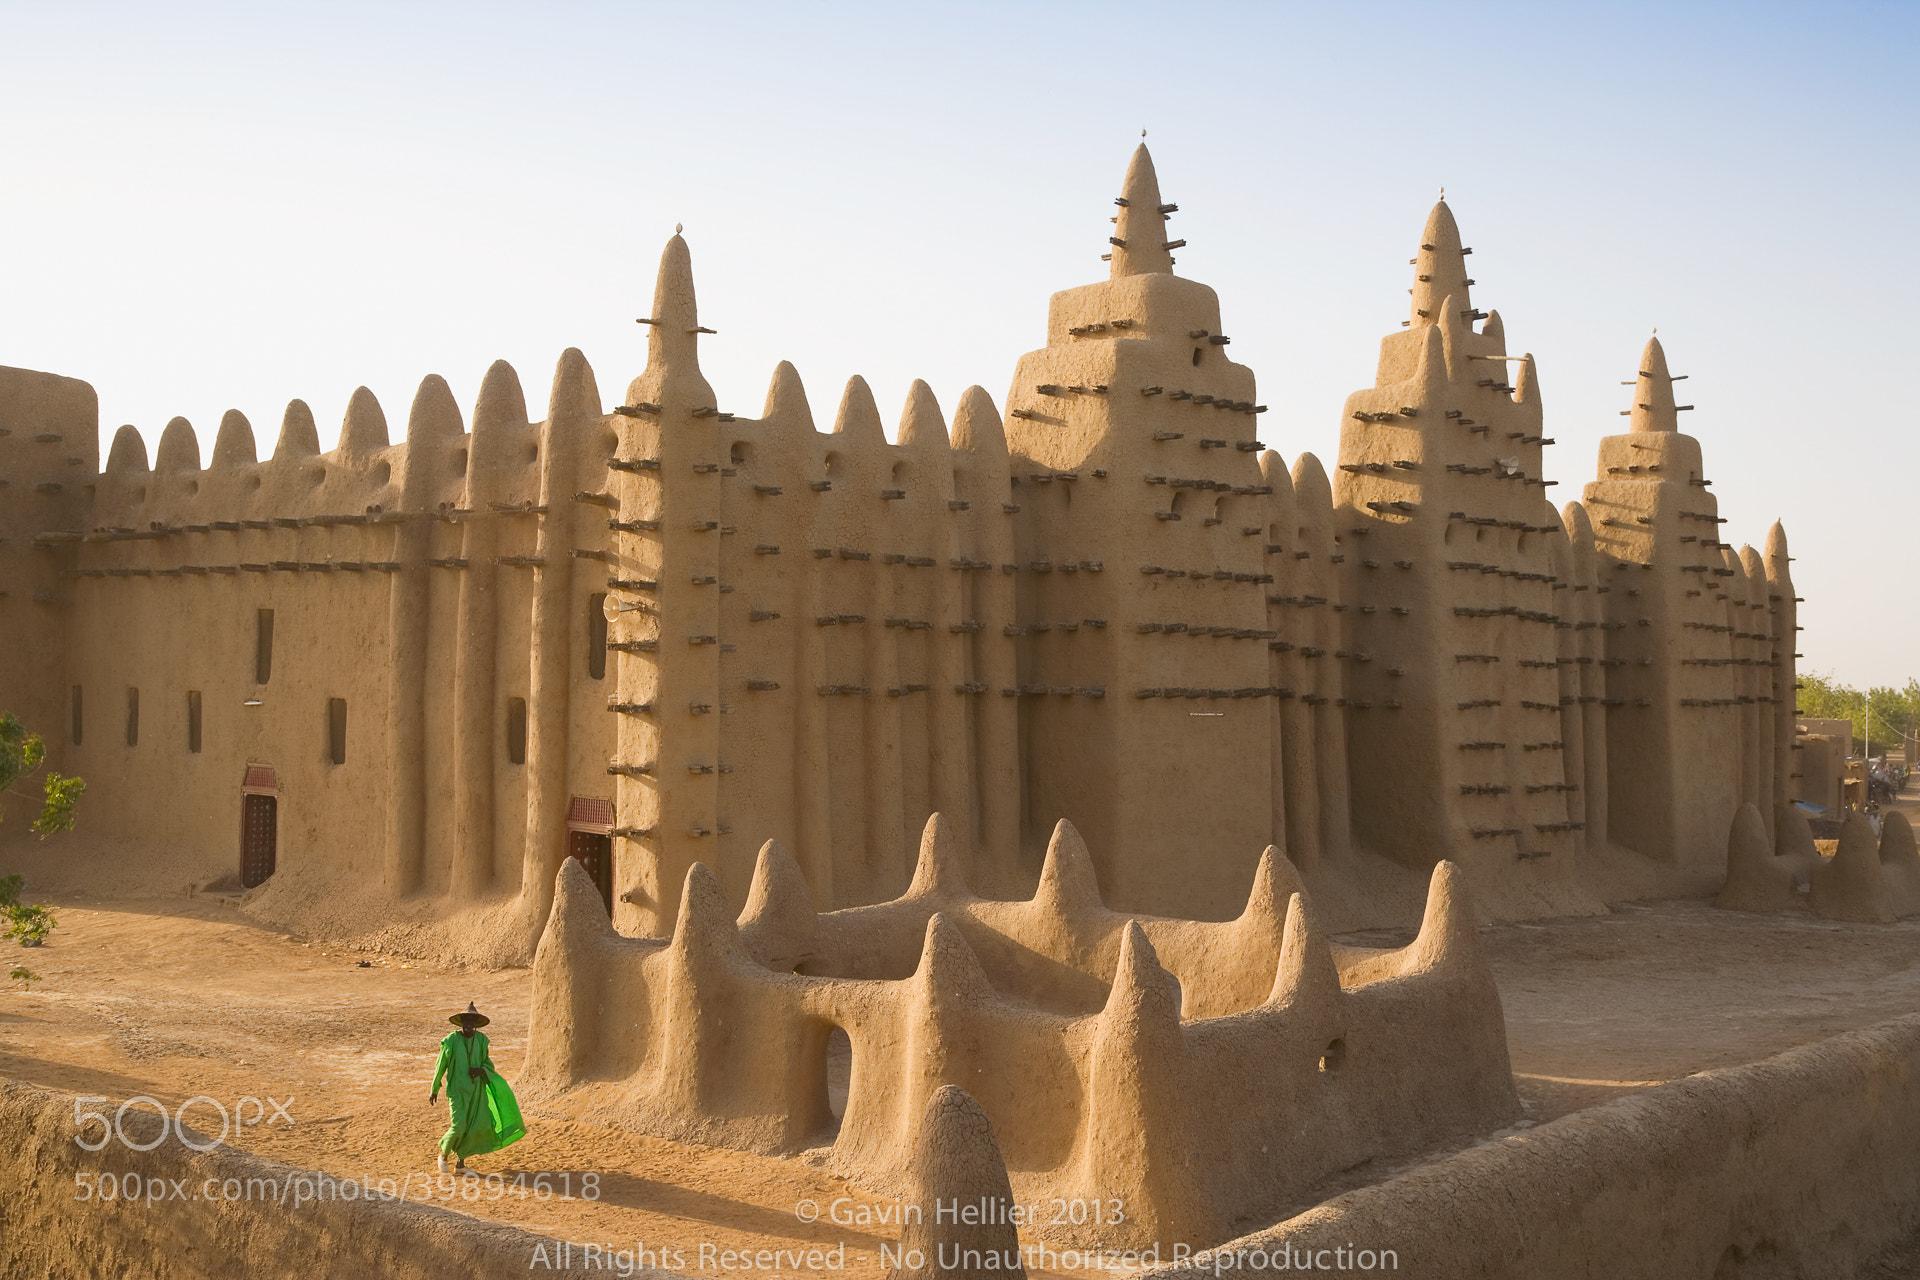 Photograph Africa, West Africa, Mali, Mopti Region, Niger Inland Delta, Djenne, Djenne Mosque by Gavin Hellier on 500px